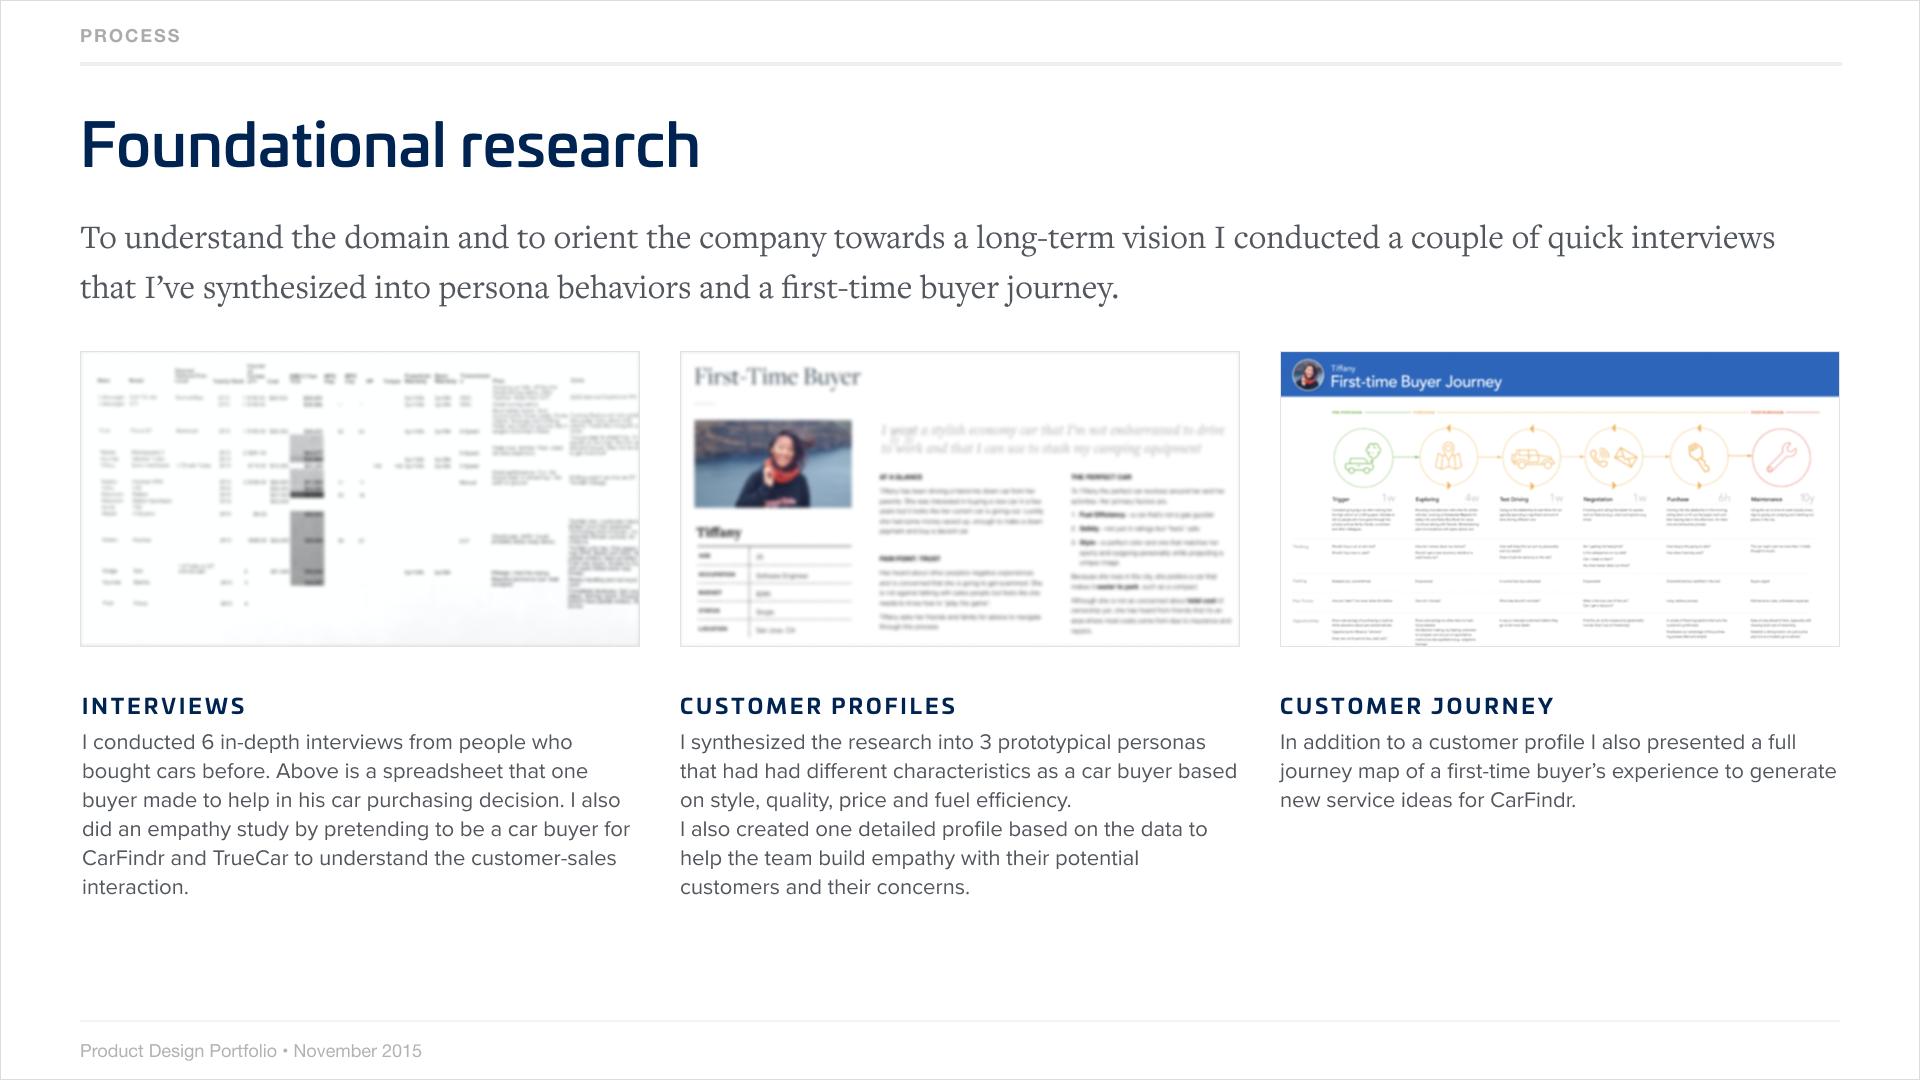 Example process slide